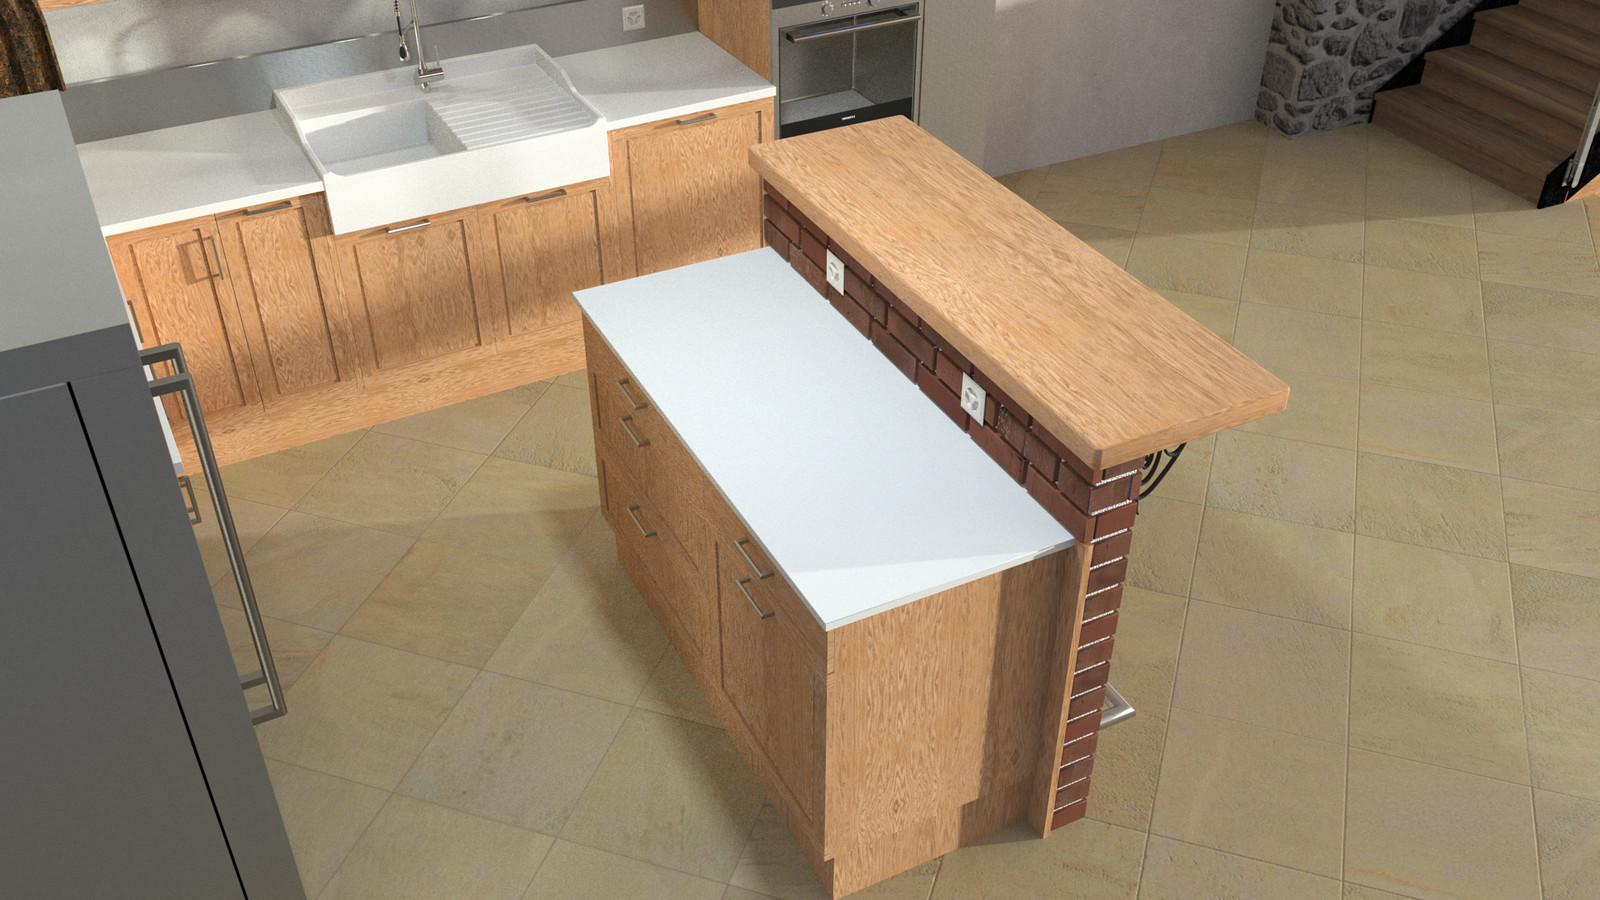 SketchUp + Thea Render  Rivendell Mill's Kitchen Bar Rivendell Brick Bar 2017-Scene 013